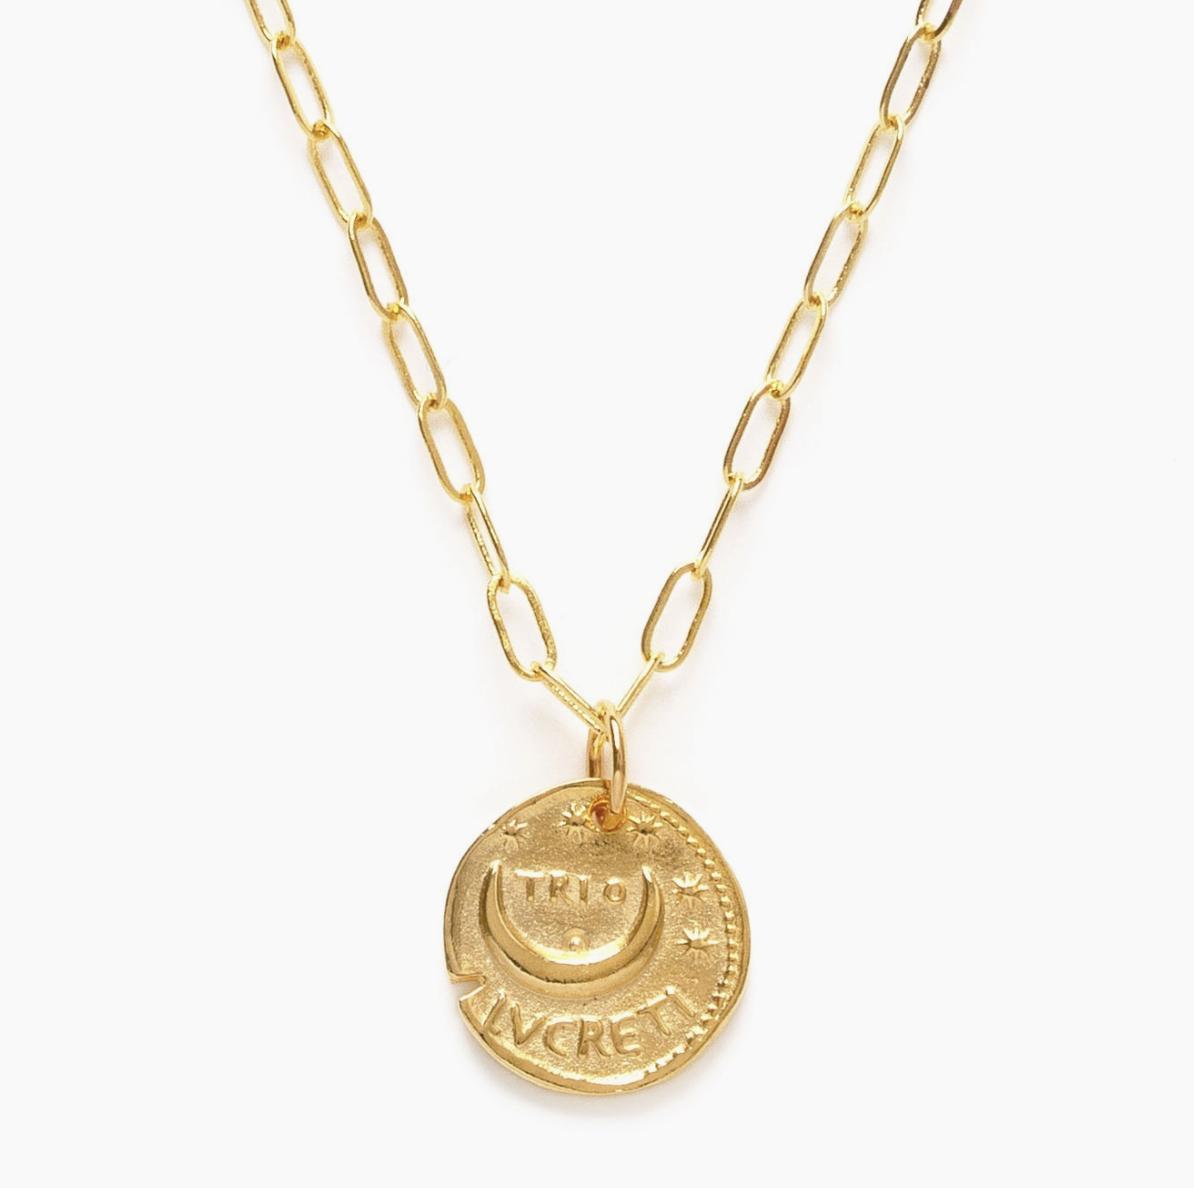 Amano Studio Roman Coin Necklace